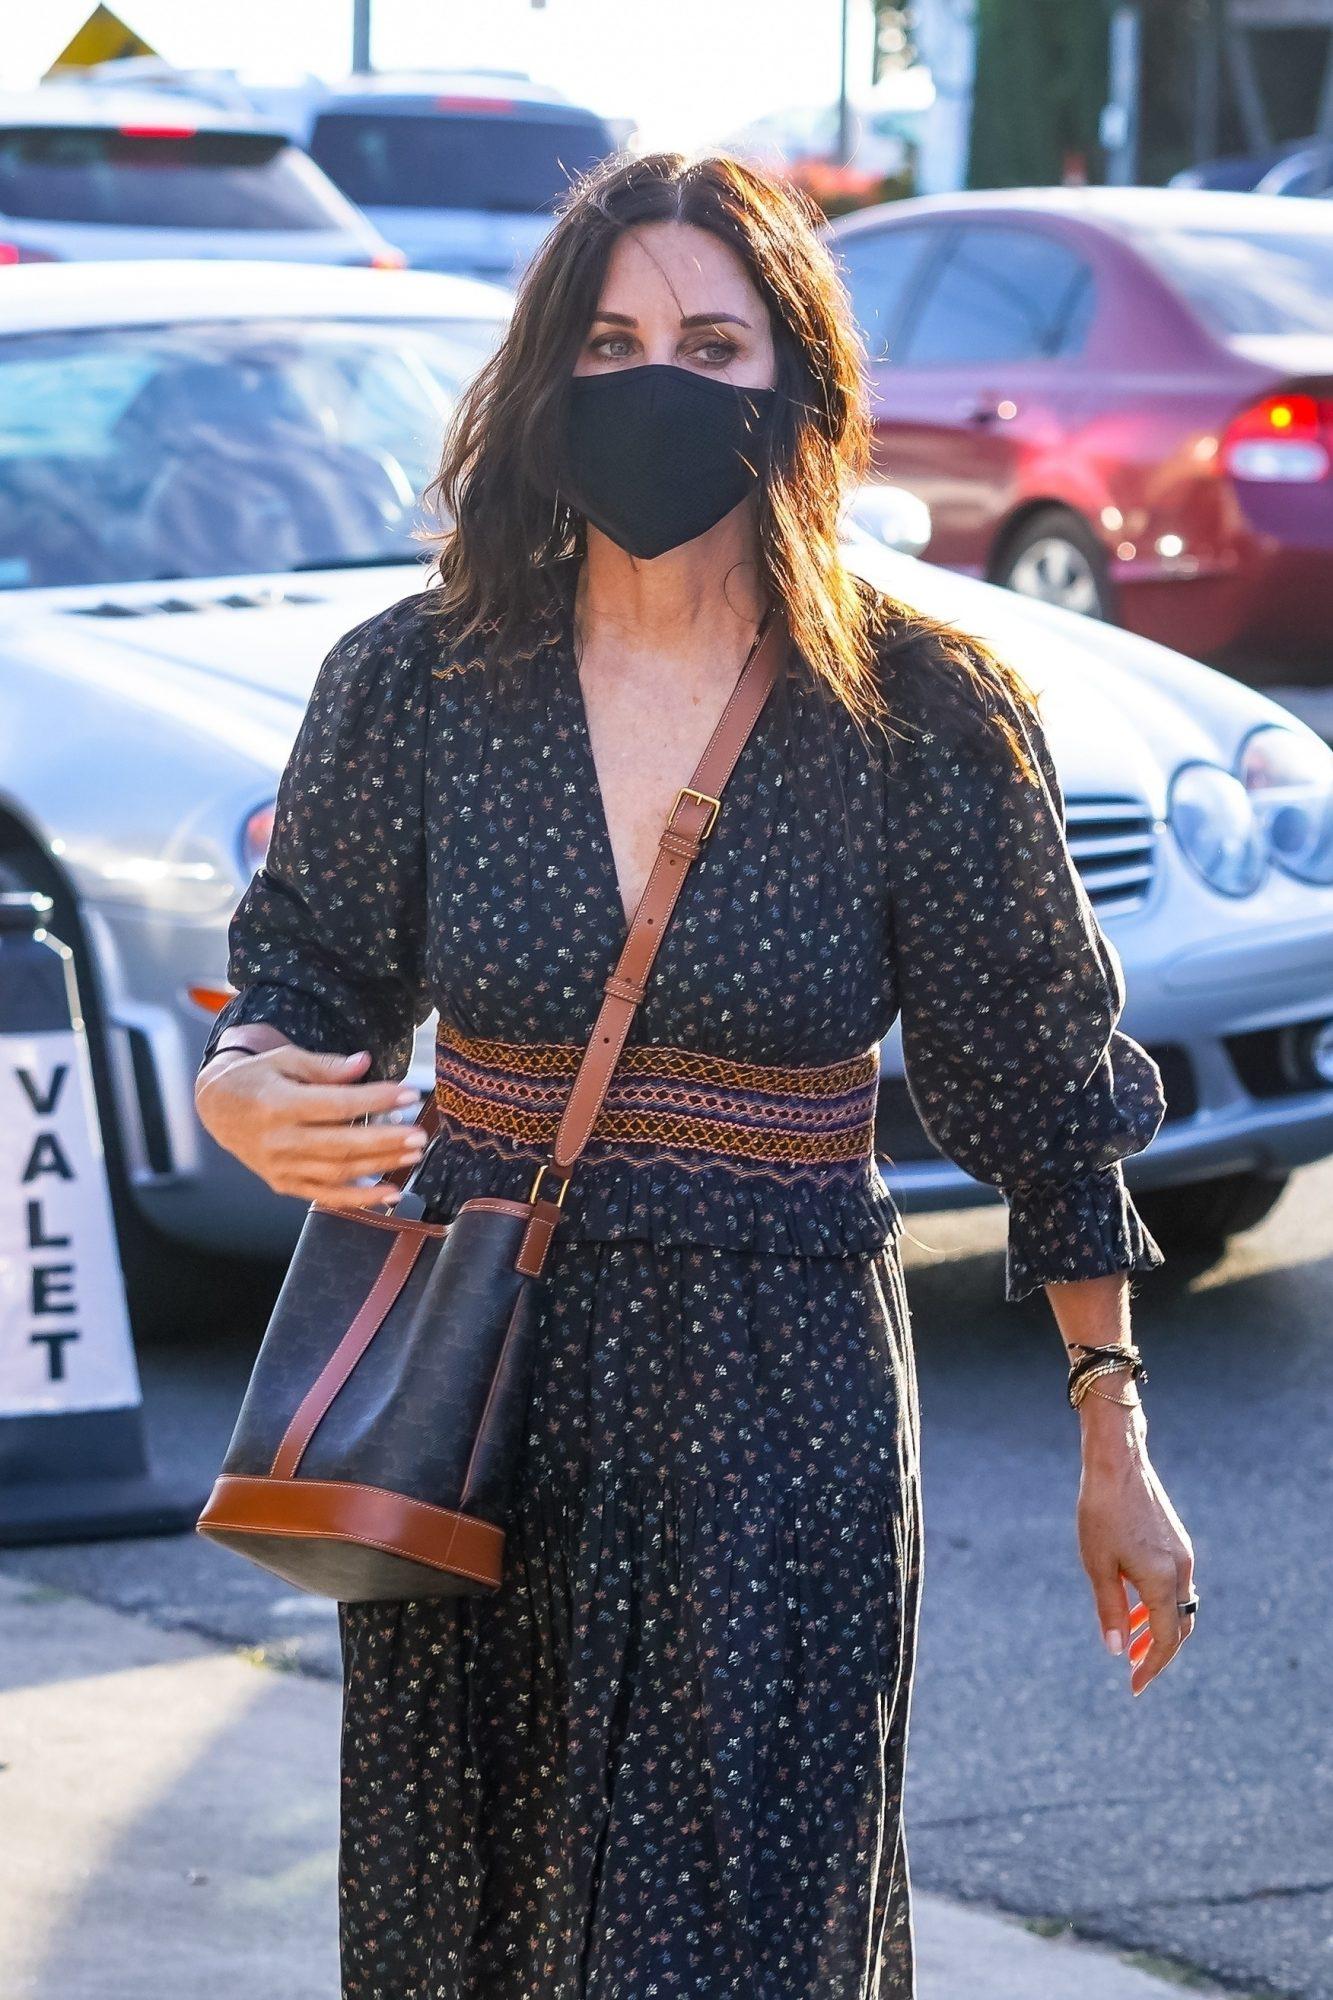 Courteney Cox Arrives to Giorgio Baldi in a Beautiful Boho Outfit